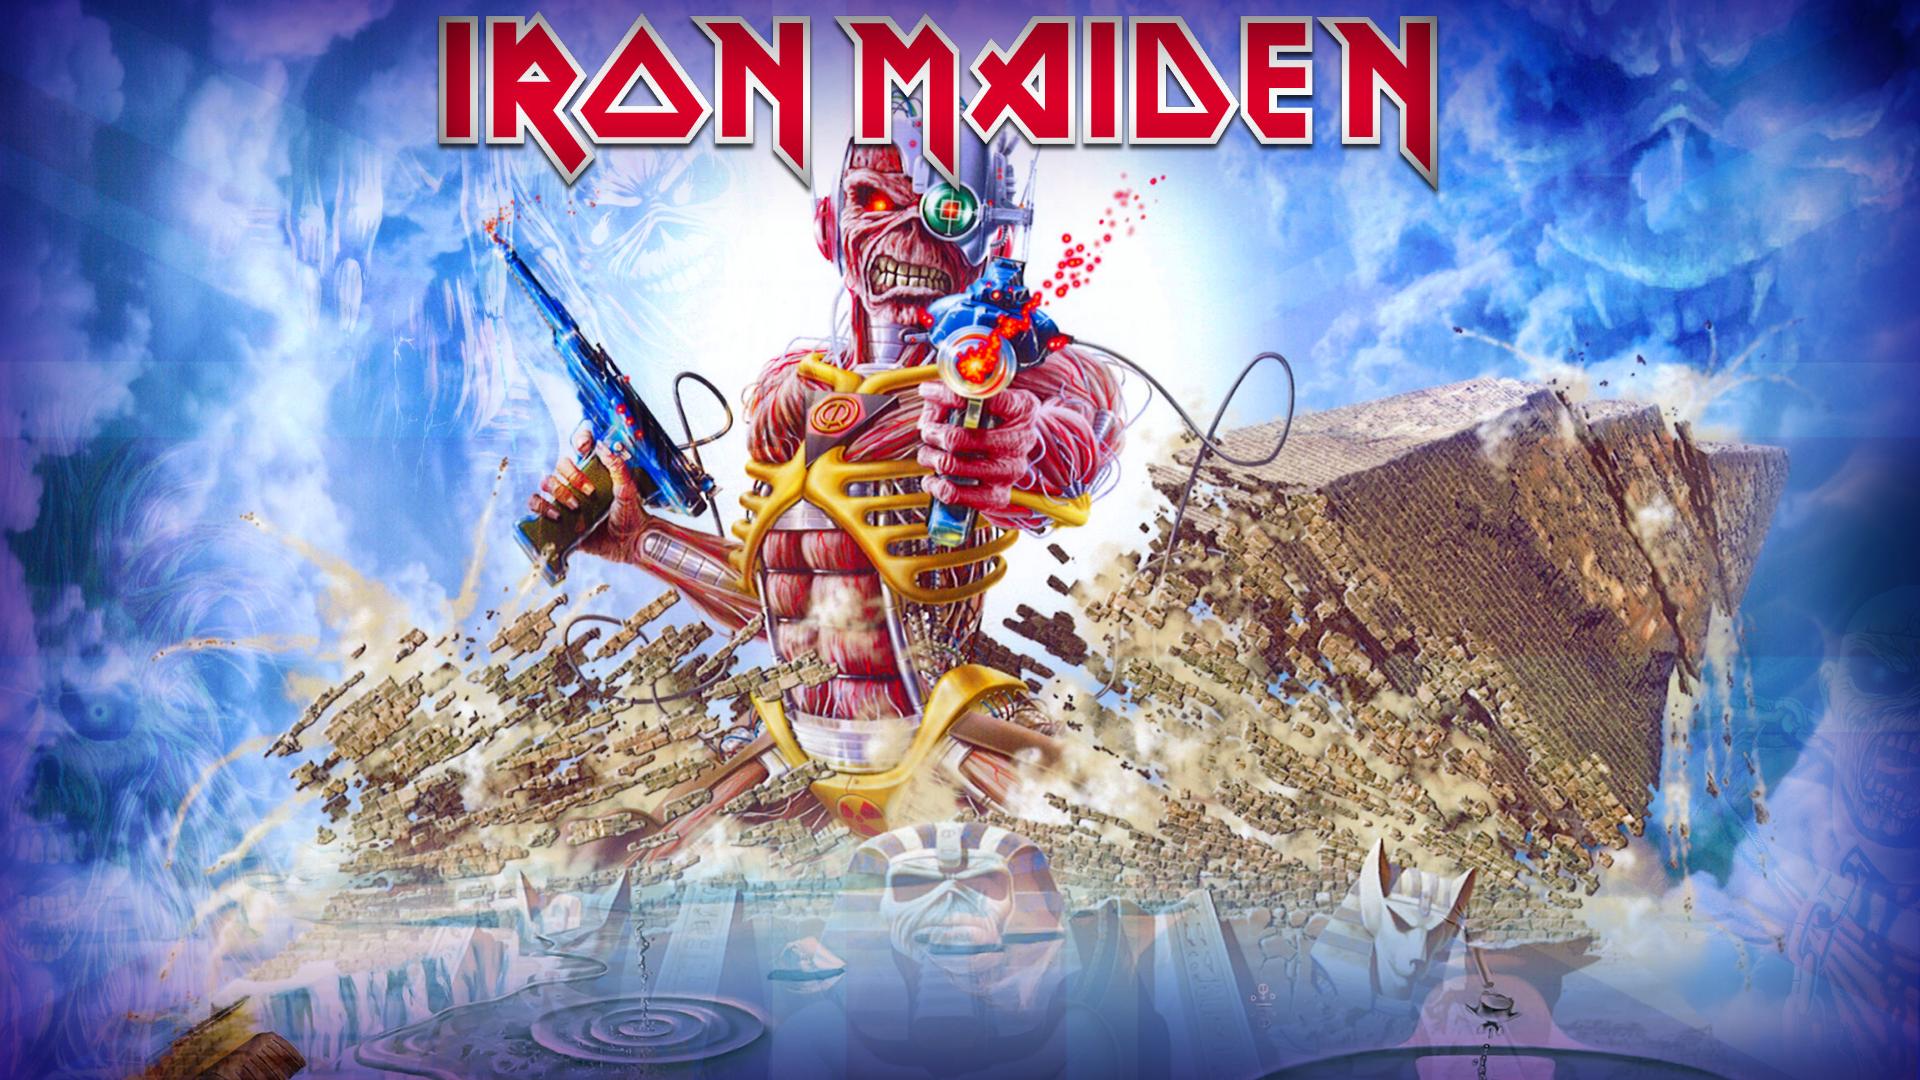 Iron Maiden Wallpaper Desktop Background On Wallpaper 1080p